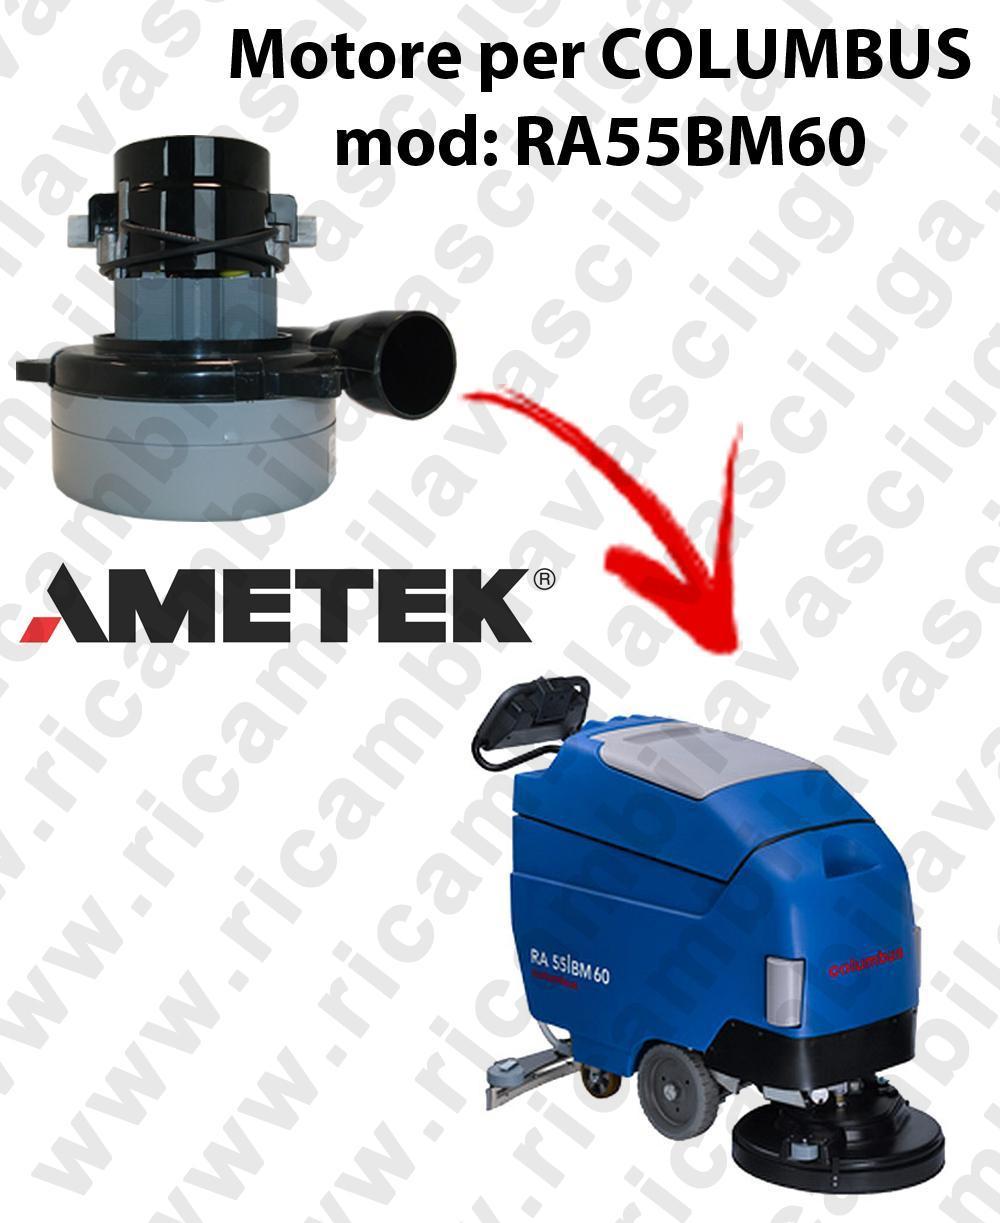 RA55BM60 Saugmotor LAMB AMETEK für scheuersaugmaschinen COLUMBUS